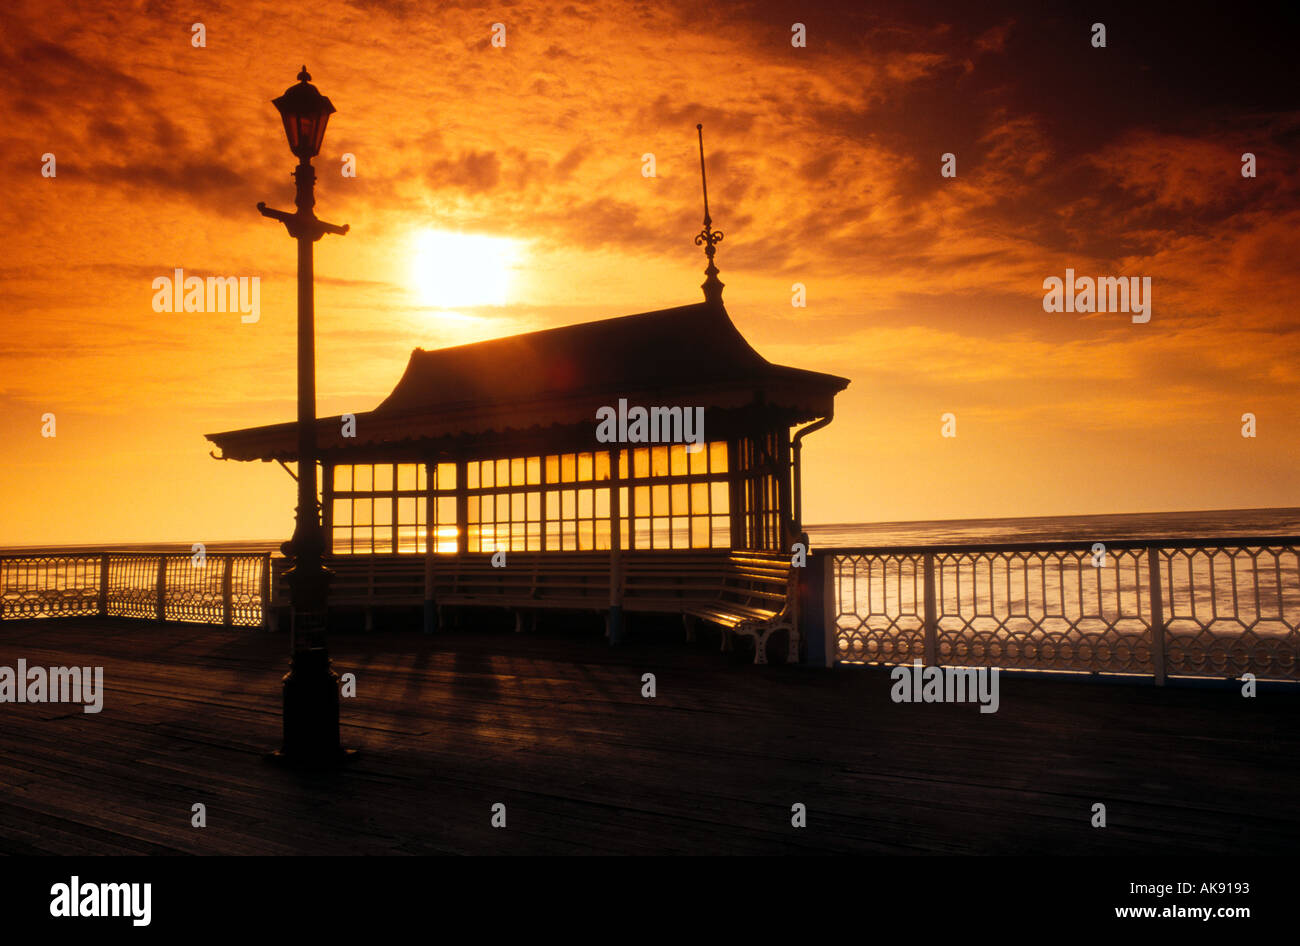 st anne s pier silhouette sunset lancashire england uk - Stock Image